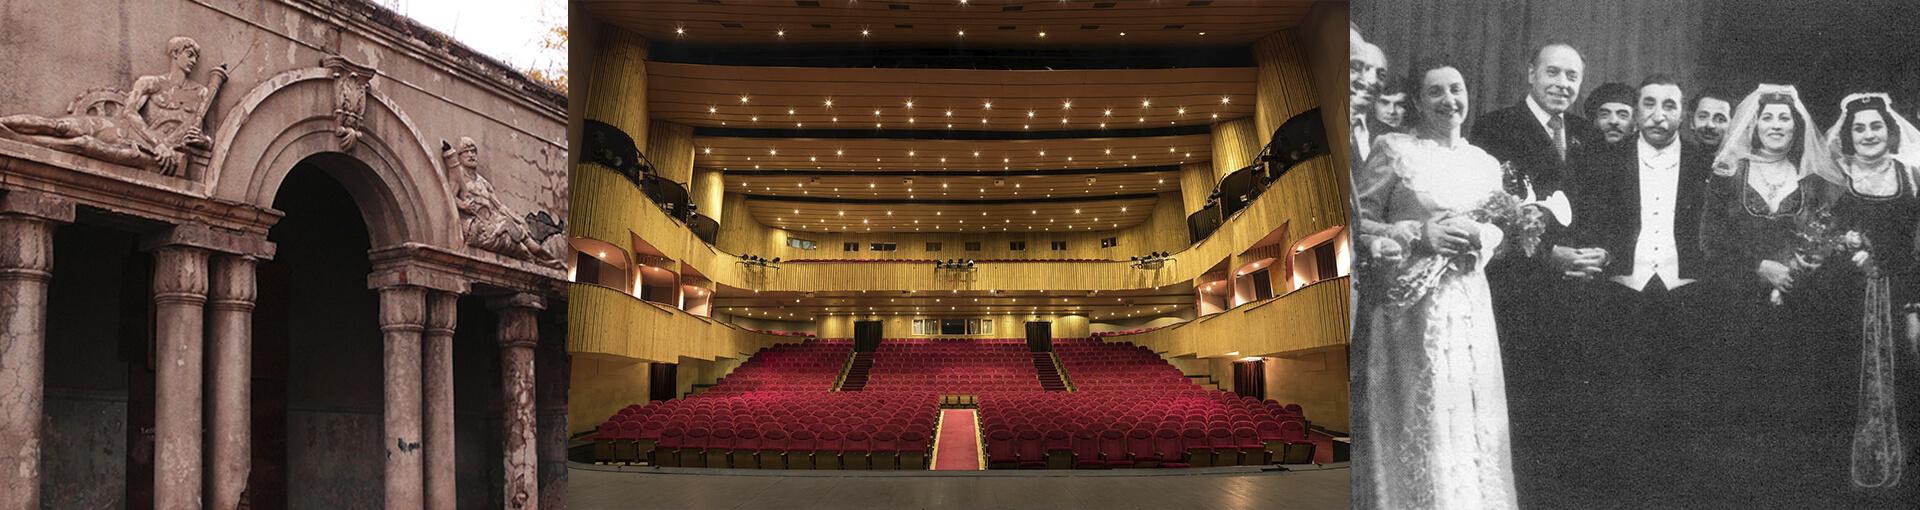 The Armenian Theatre